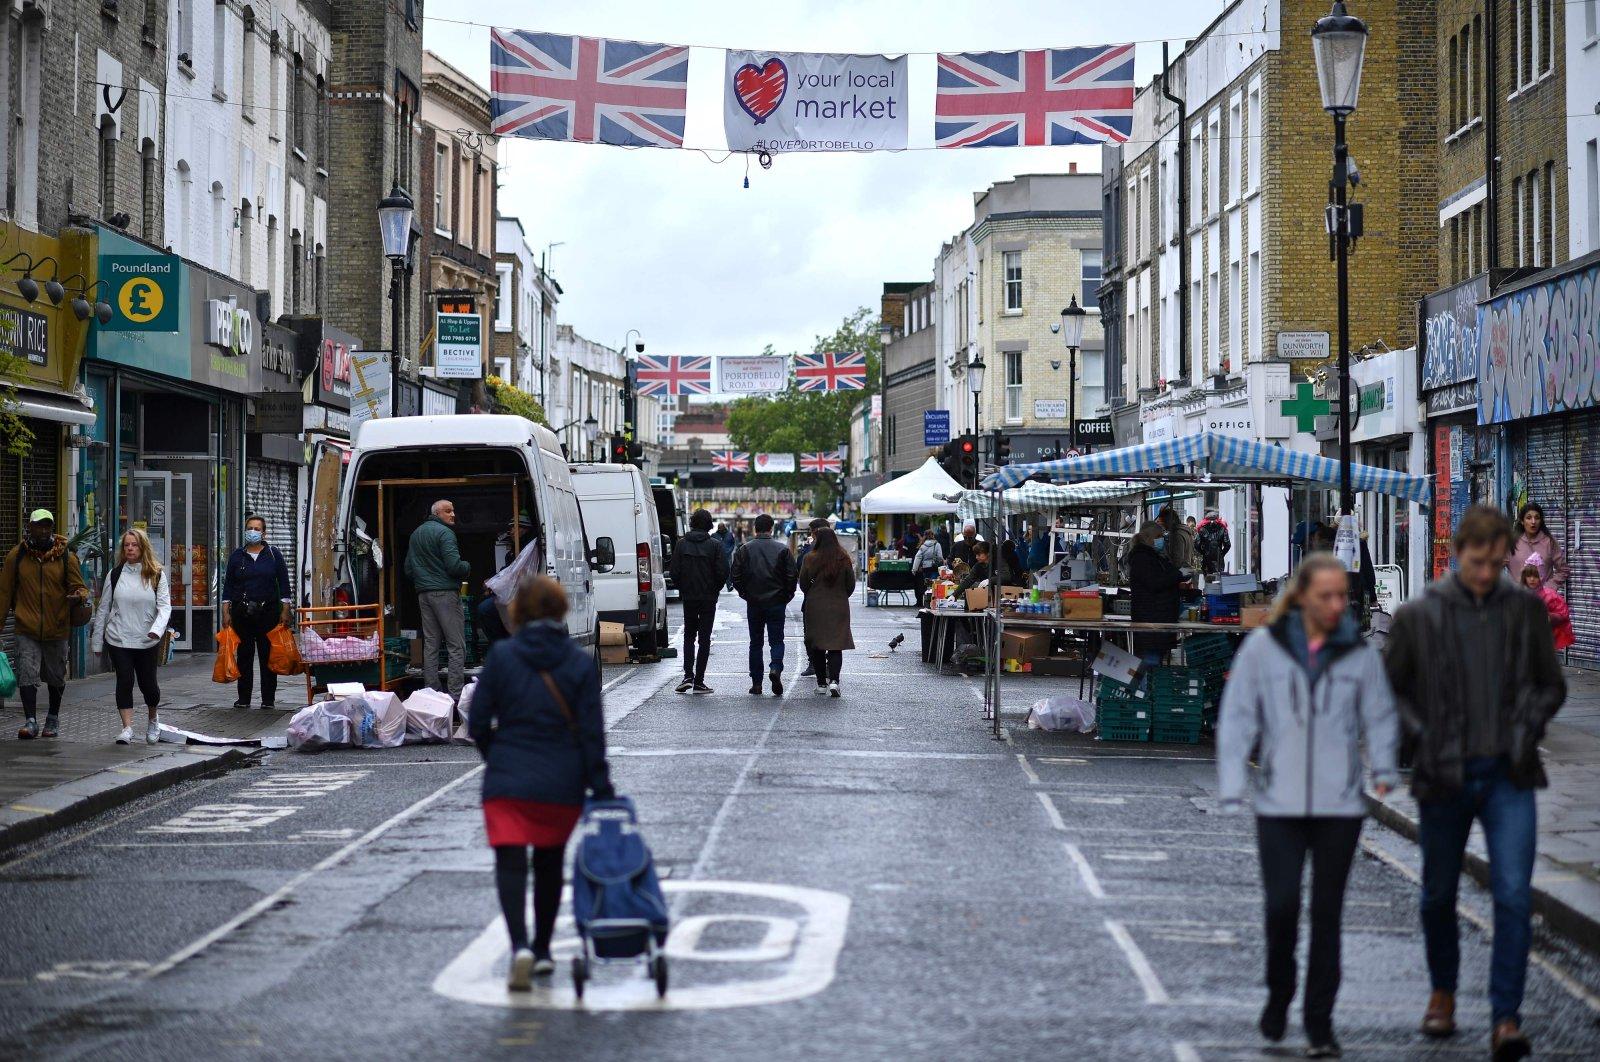 People walk past stalls at an almost deserted Portobello Road Market, London, June 6, 2020. (AFP Photo)